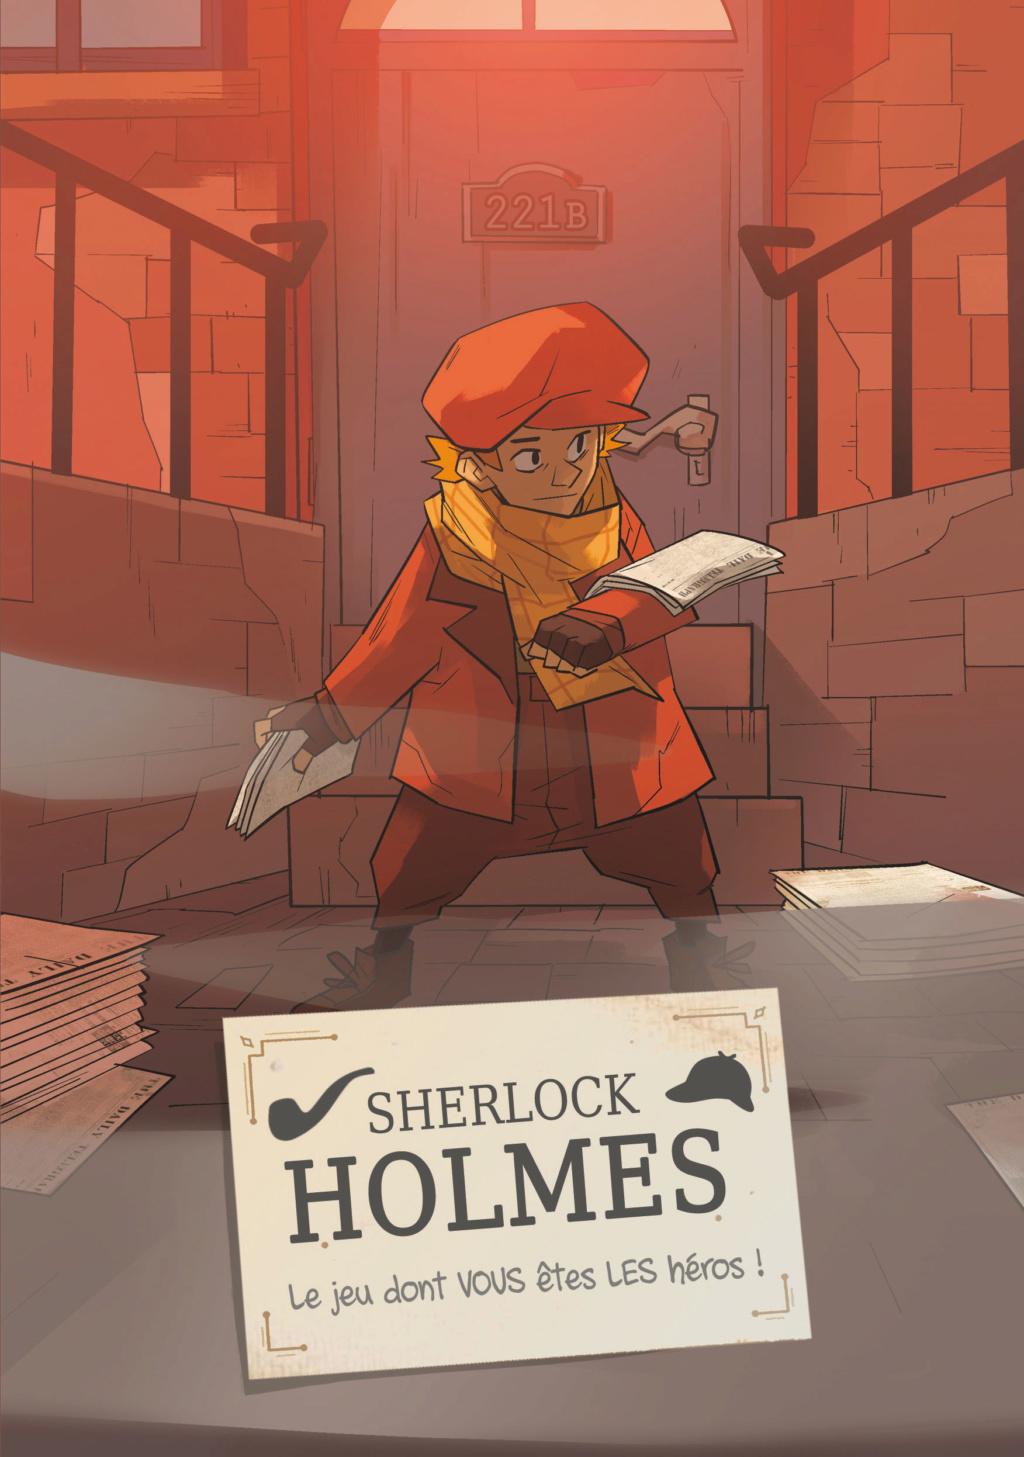 [Makaka] Sherlock Holmes, le jeu dont vous êtes LES héros Wigins10